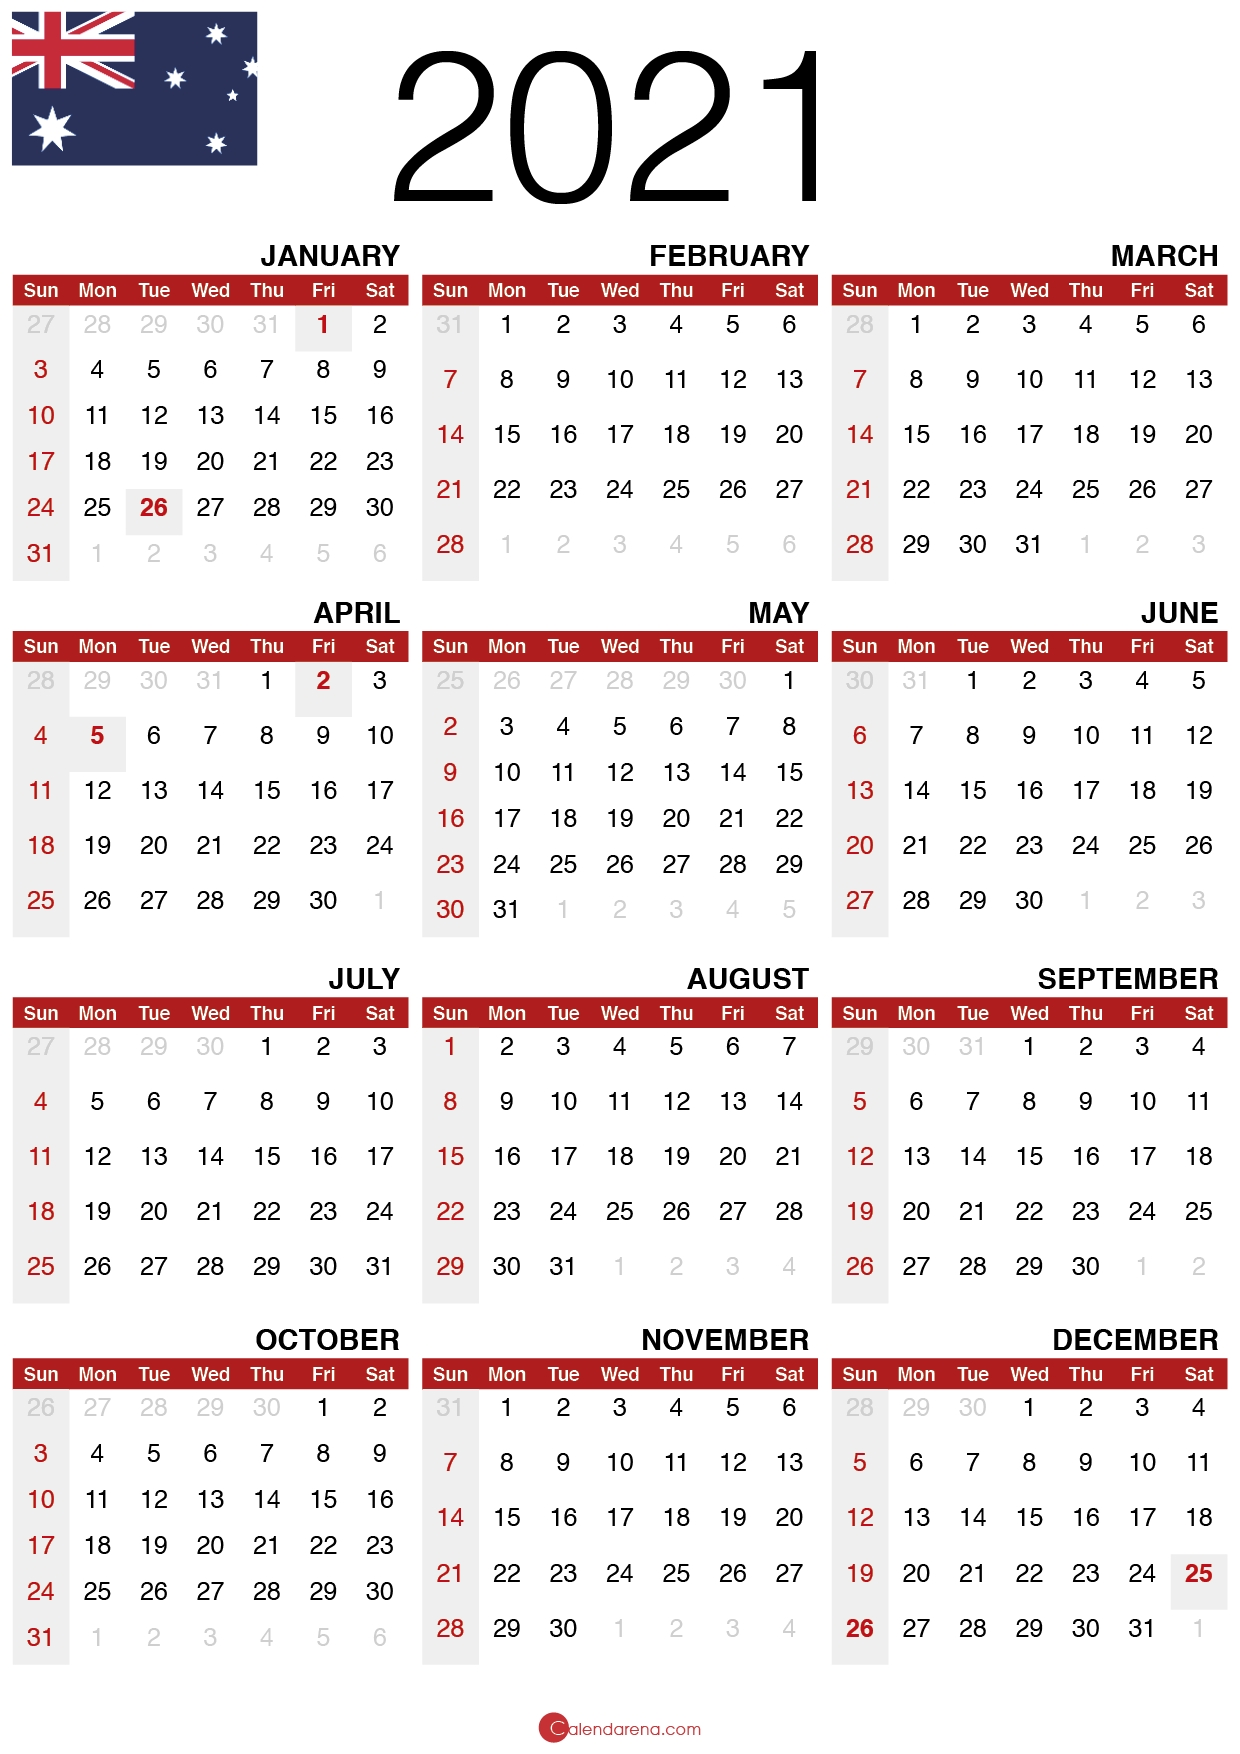 Download Free 2021 Calendar Australia 🇦🇺